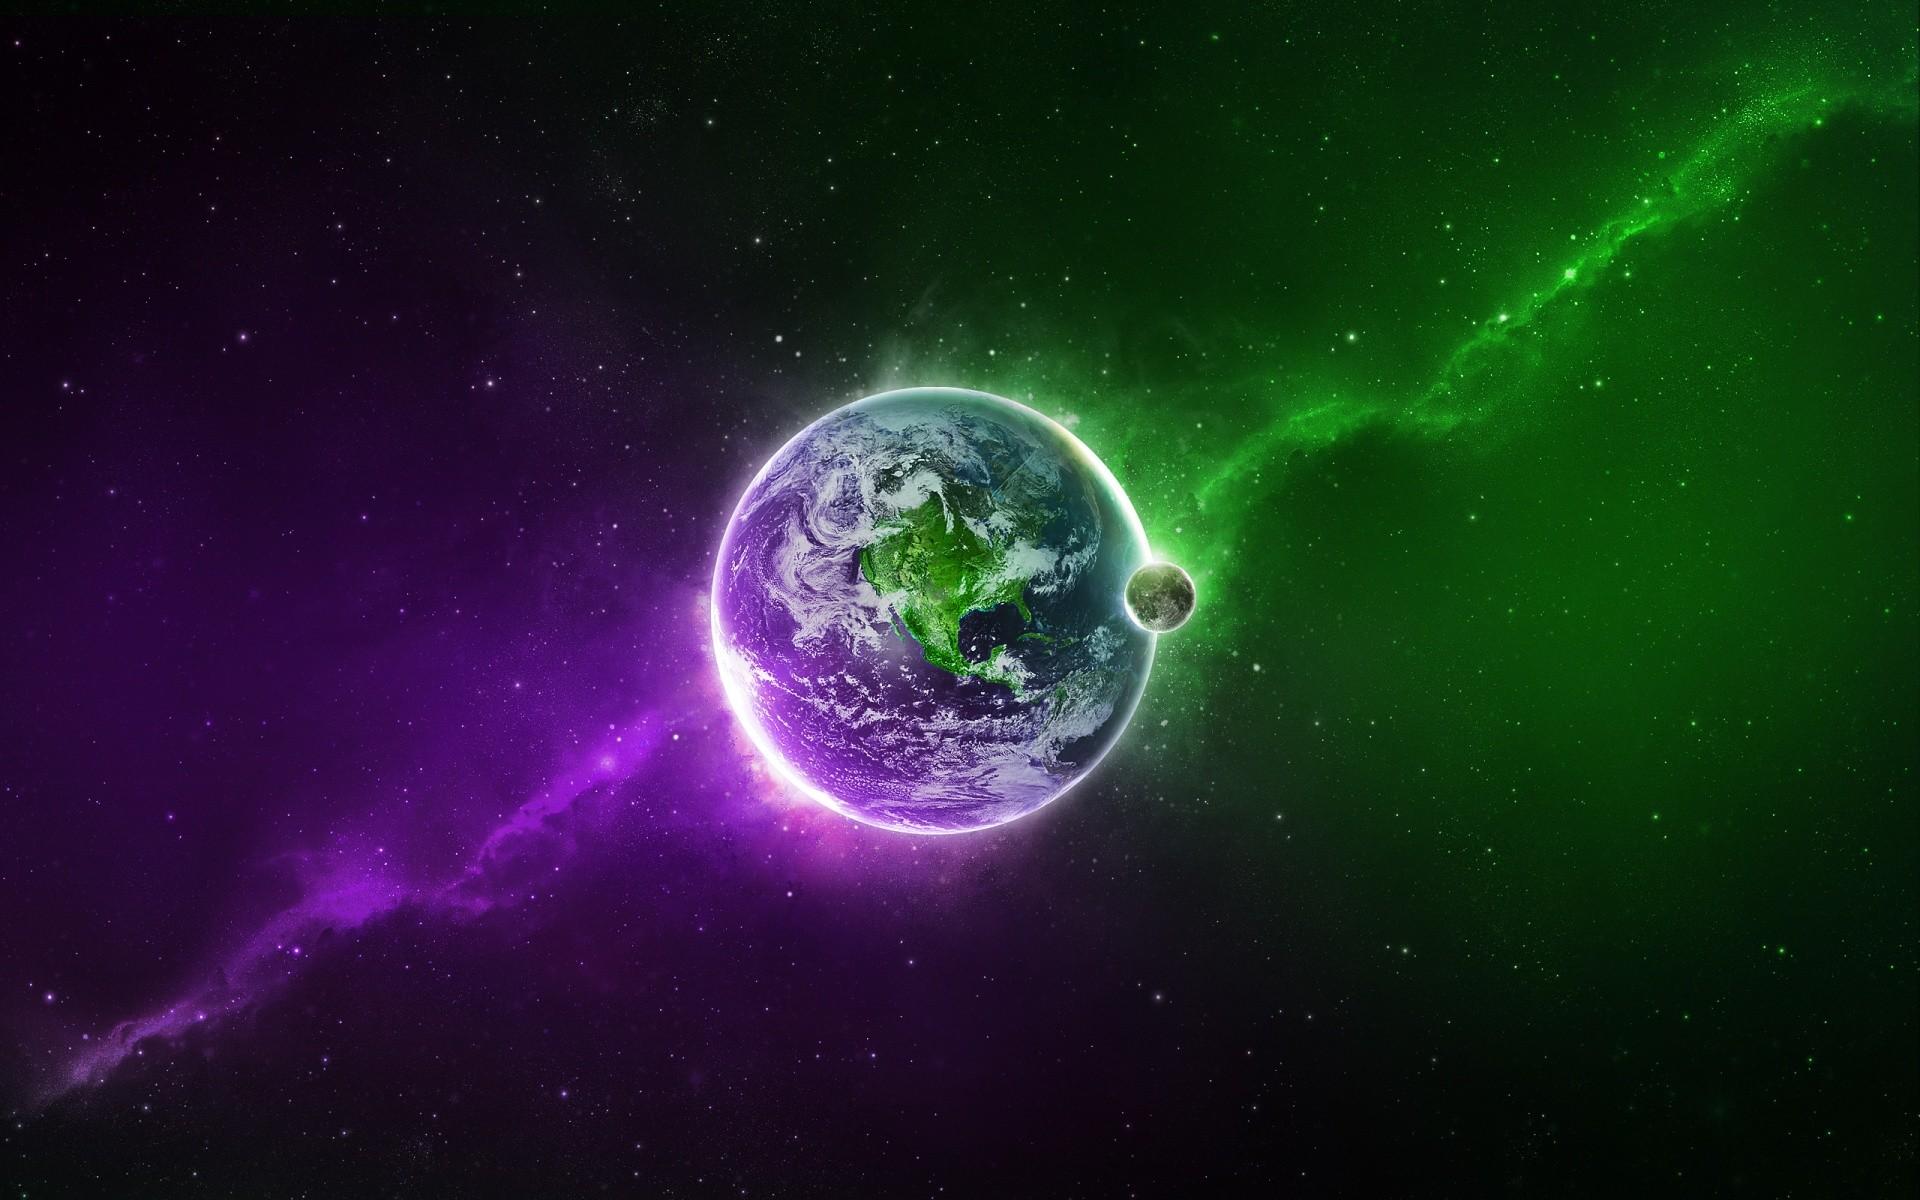 Purple &Amp; Green Wallpaper